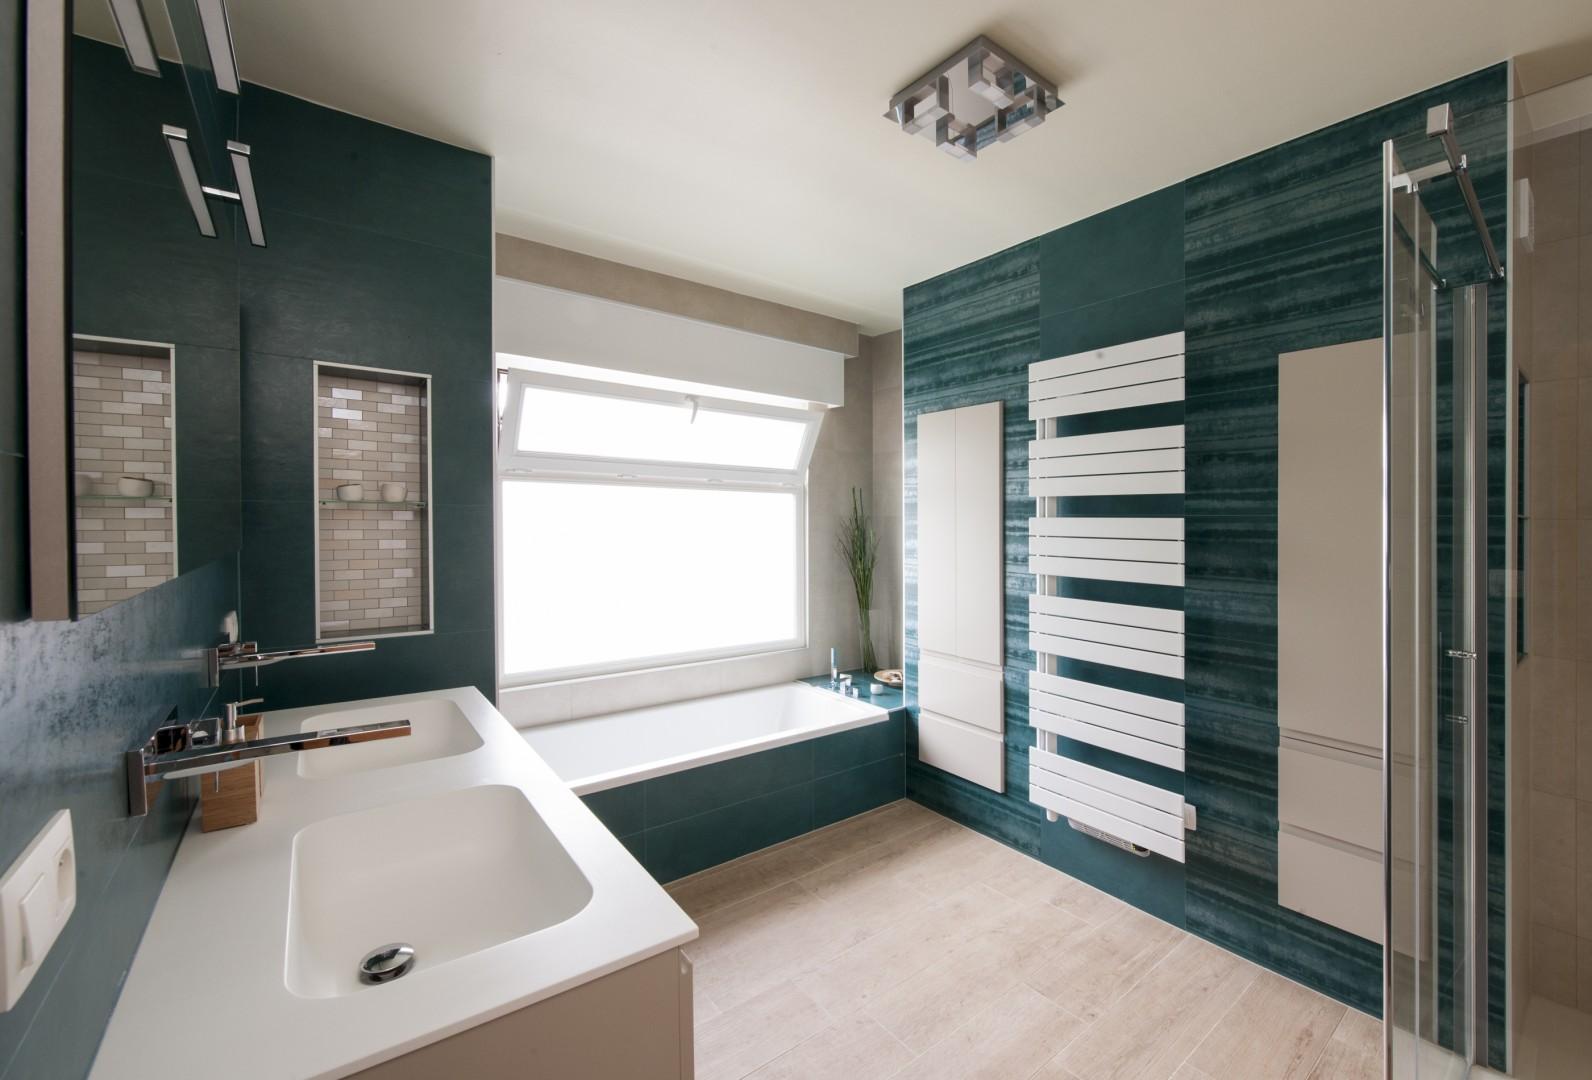 Assemblage de couleurs turquoise et bois cr ations gillet for Gillet carrelage